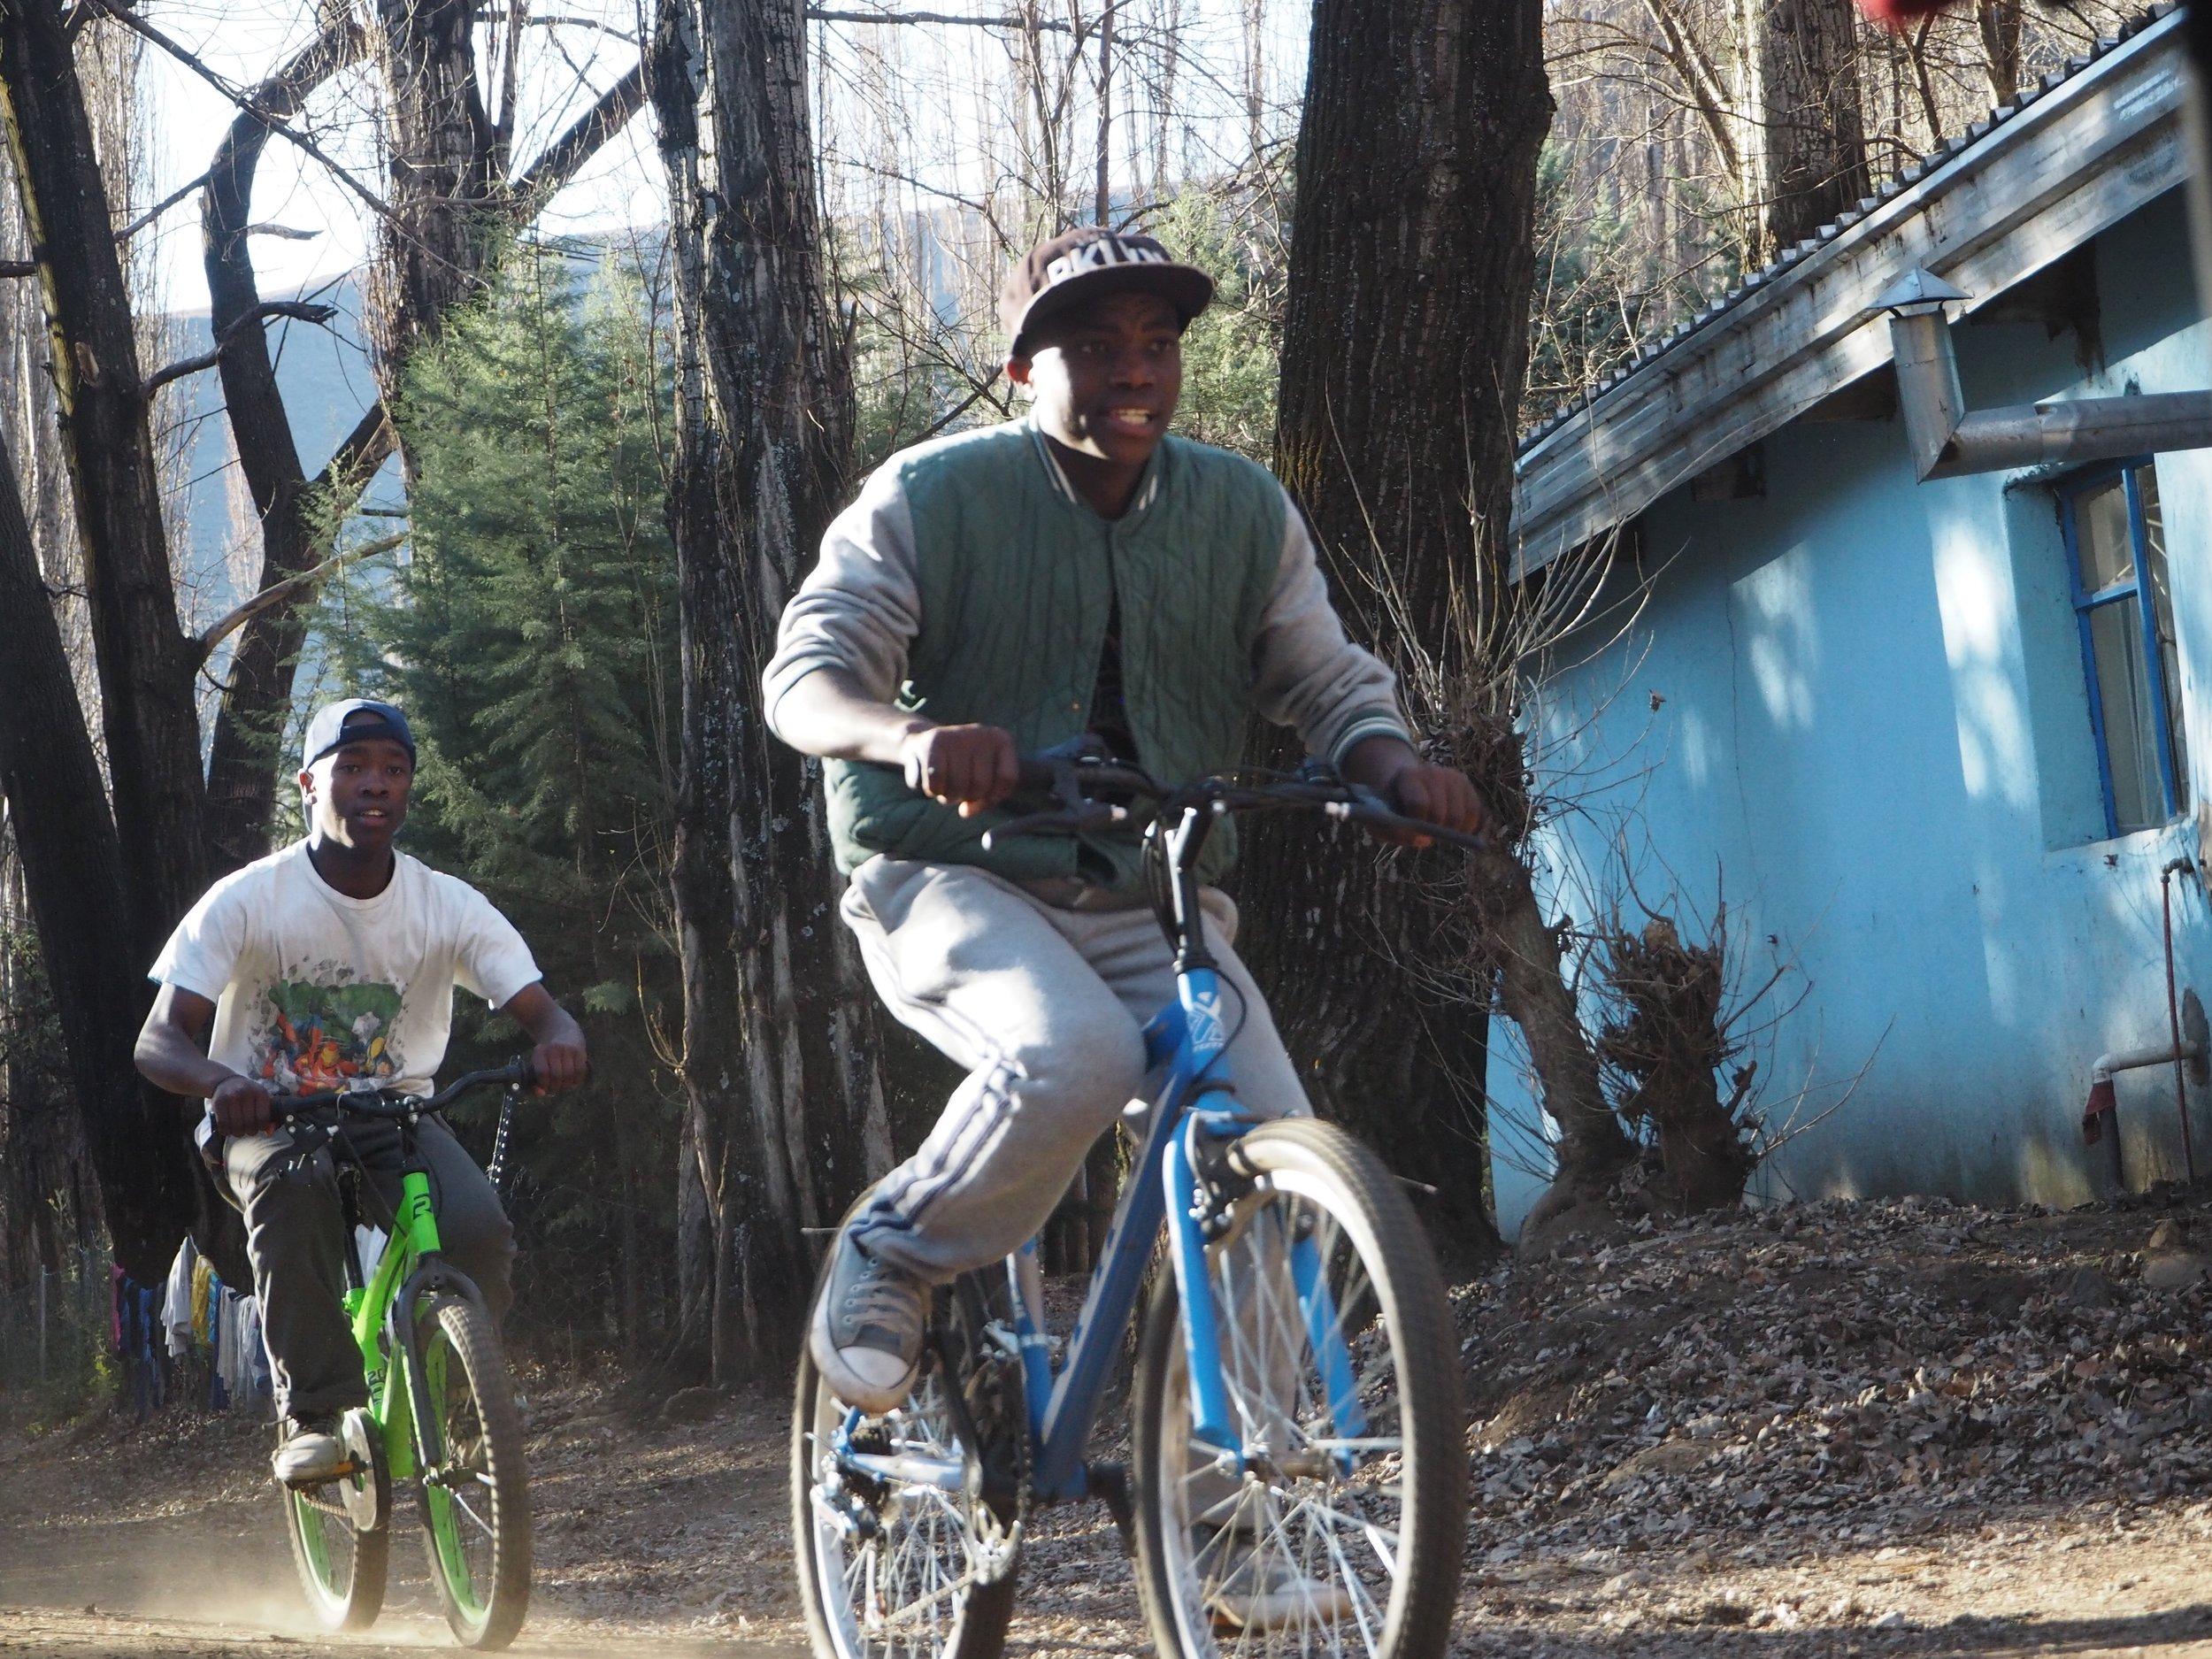 The boys enjoying a Saturday racing bikes